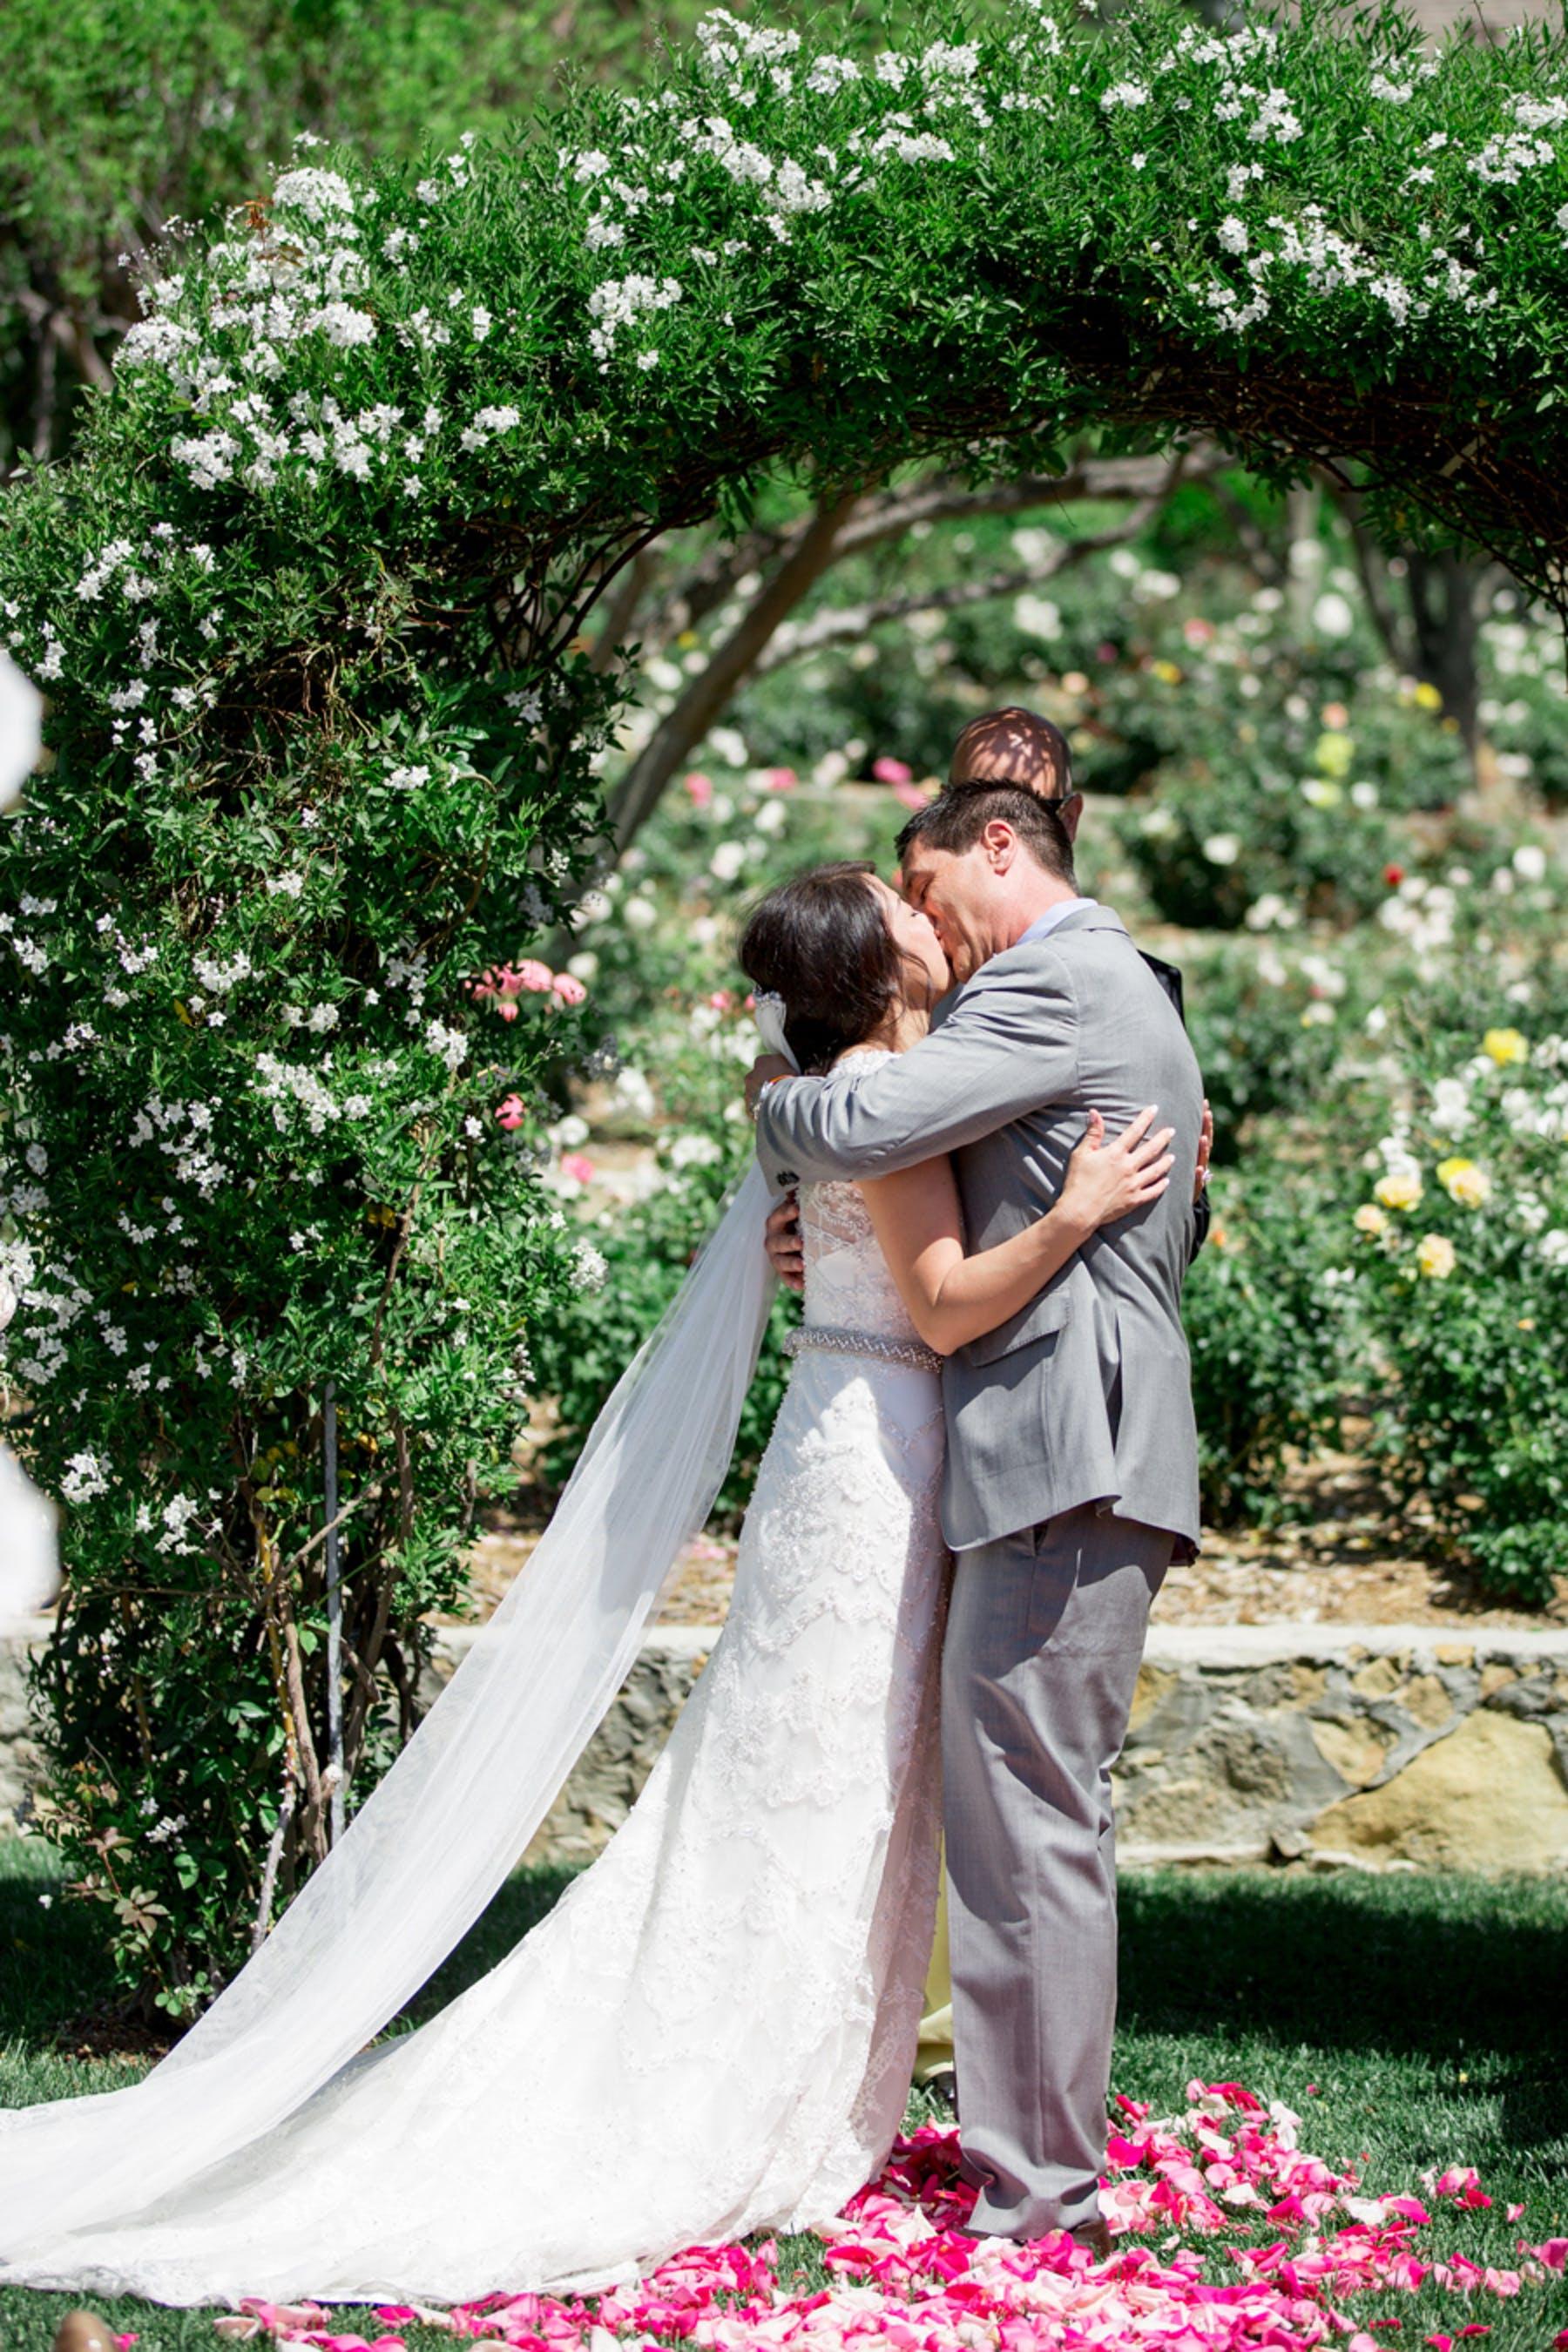 www.santabarbarawedding.com | Michael + Anna Costa Photography | San Ysidro Ranch | Twine Events | The Bride and Groom Share a Kiss